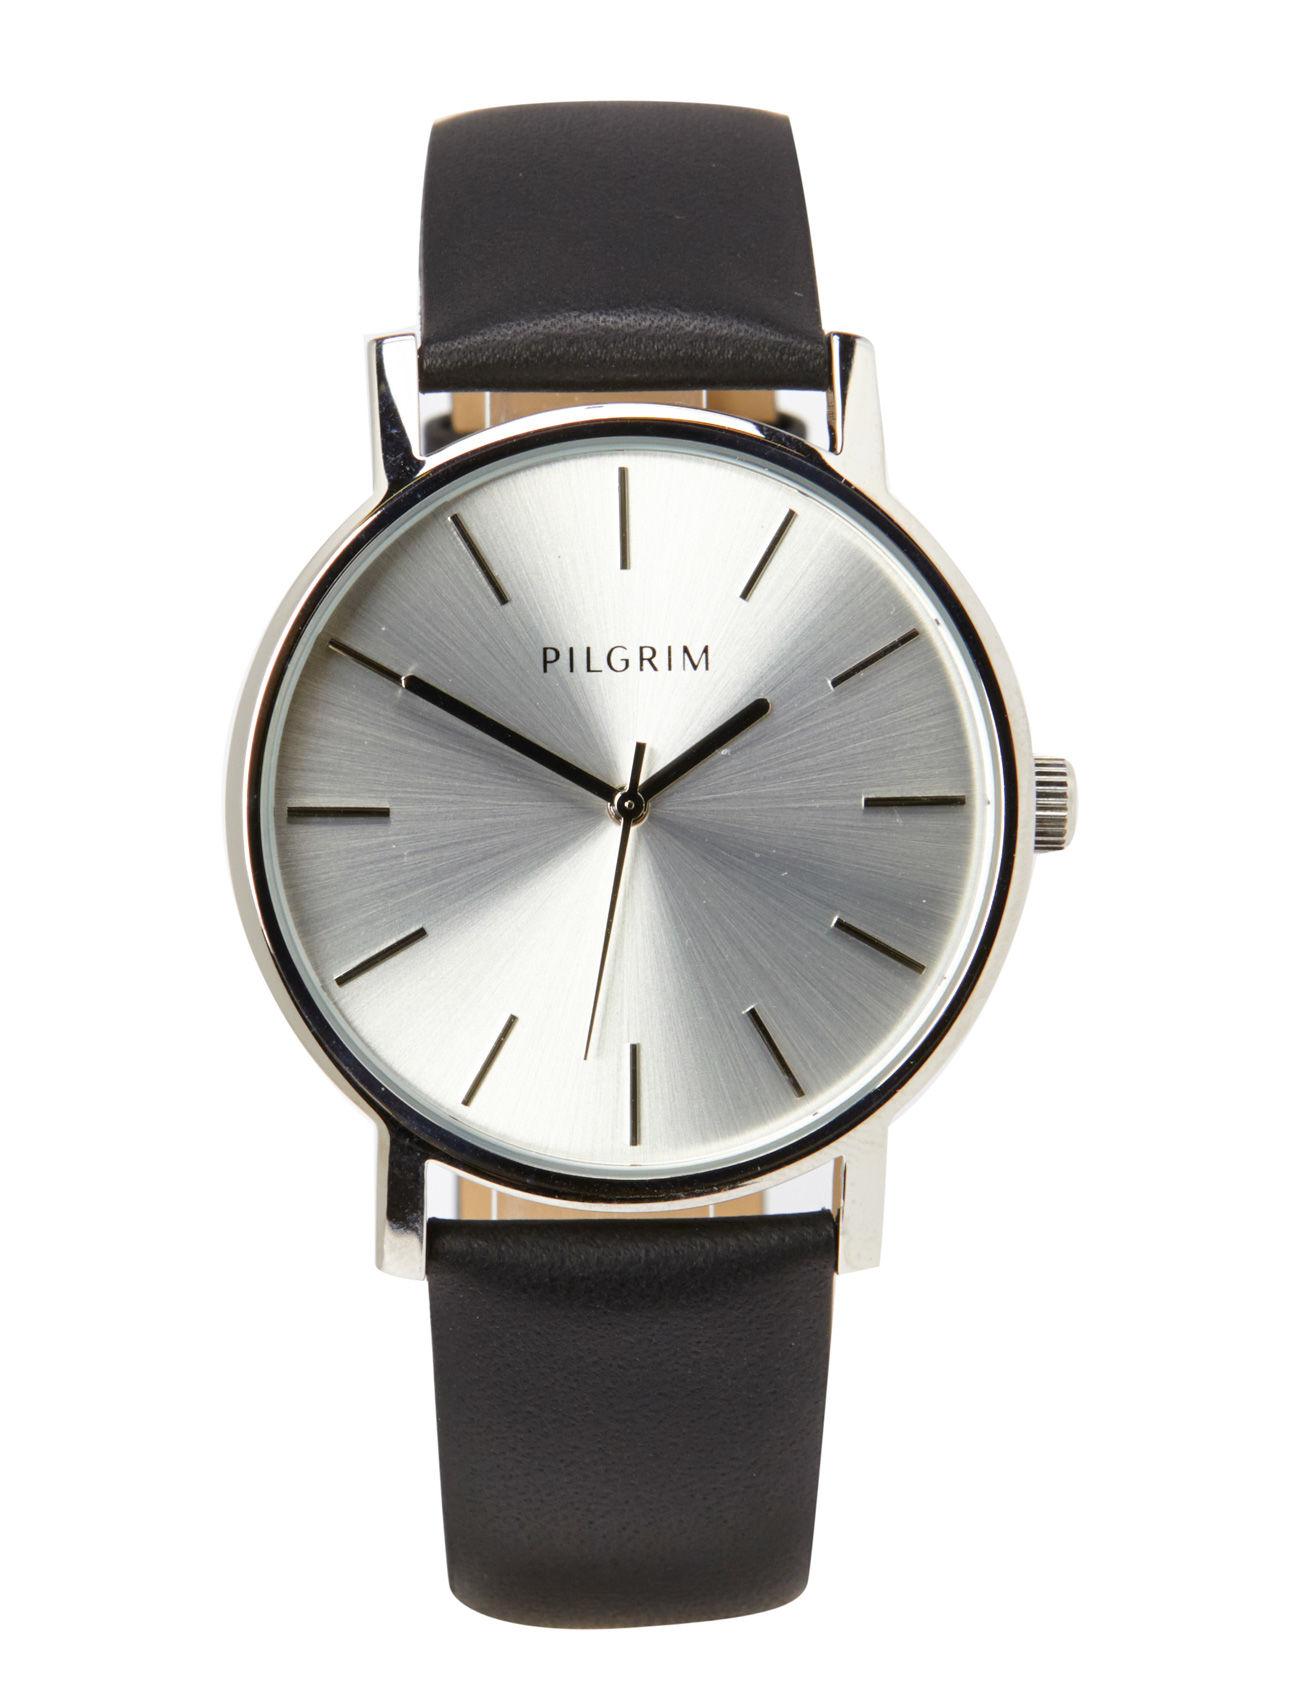 Pilgrim Watches